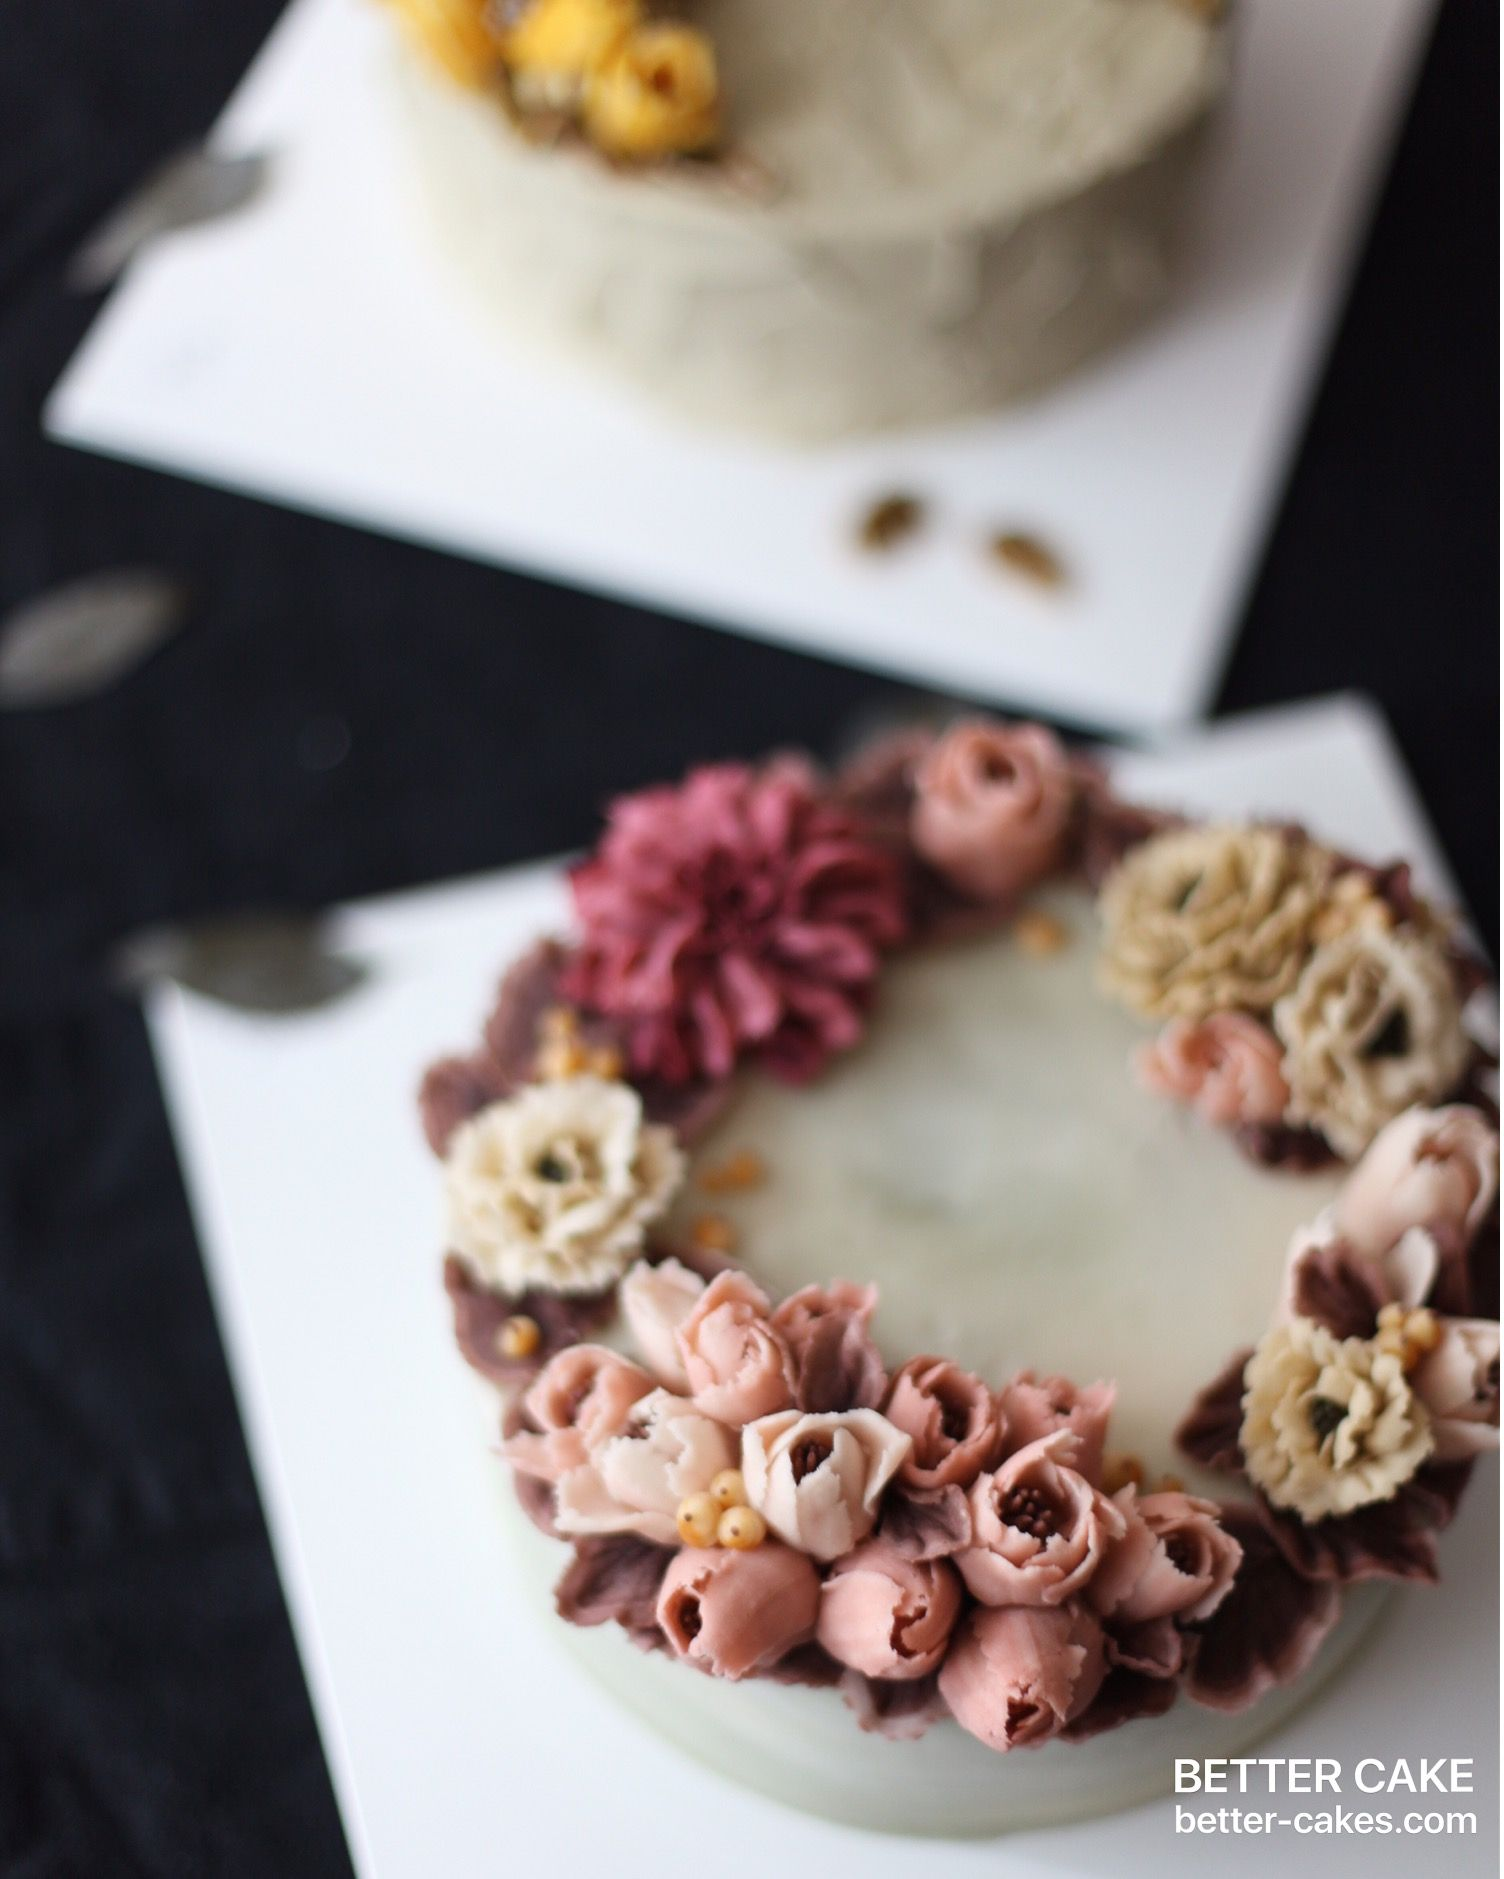 . Done by my student from Japan Beanpaste & Rice cake  Any inquiries about BETTER CLASS, Mailbettercakes@naver.com Linebetter_cake FacebookBetter Cake Kakaotalkleesumin222  #buttercream#cake#베이킹#baking#bettercake#like#버터크림케익#베러케이크#cupcake#flower#꽃#sweet#플라워케익#koreabuttercream#wilton#앙금플라워#ricecake#buttercreamcake#dessert#버터크림플라워케익#follow#beanpaste#koreancake#beautiful#윌튼#instacake#꽃스타그램#떡케이크#instafood#flowercake